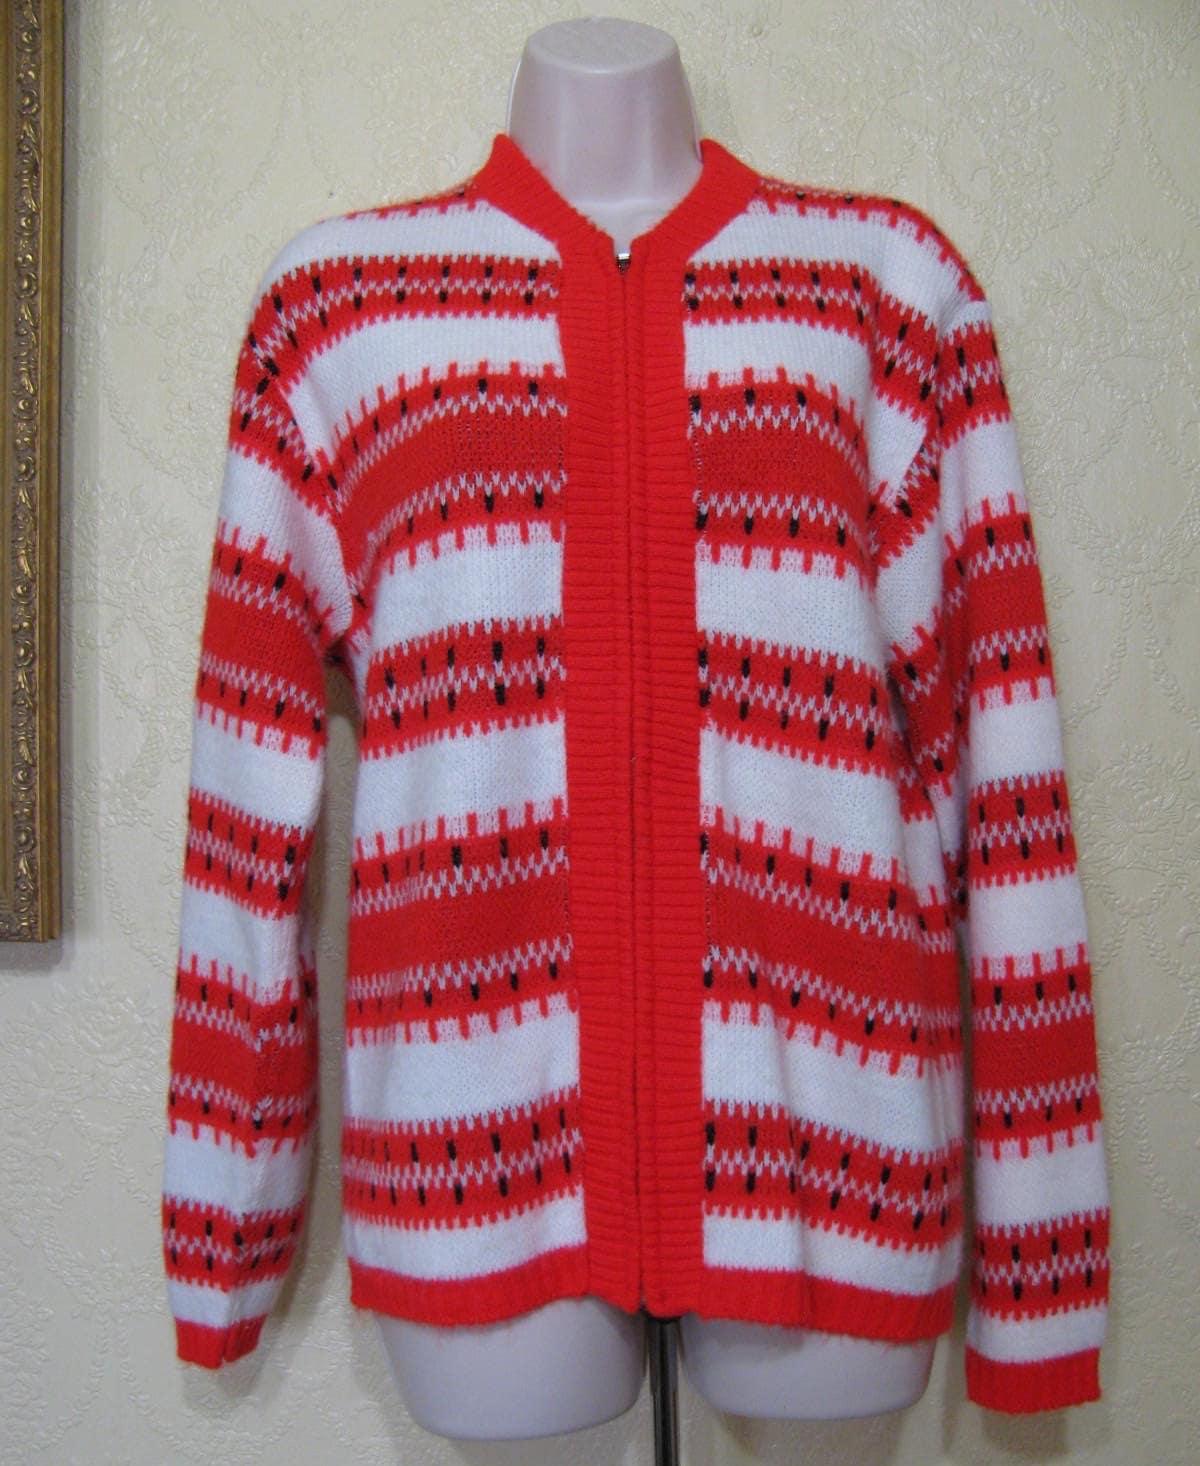 1950s Mens Hats | 50s Vintage Men's Hats 1950s Womens Mens Zip Up Vintage Christmas Sweater Size M Revere Vereloft Sportswear $5.99 AT vintagedancer.com